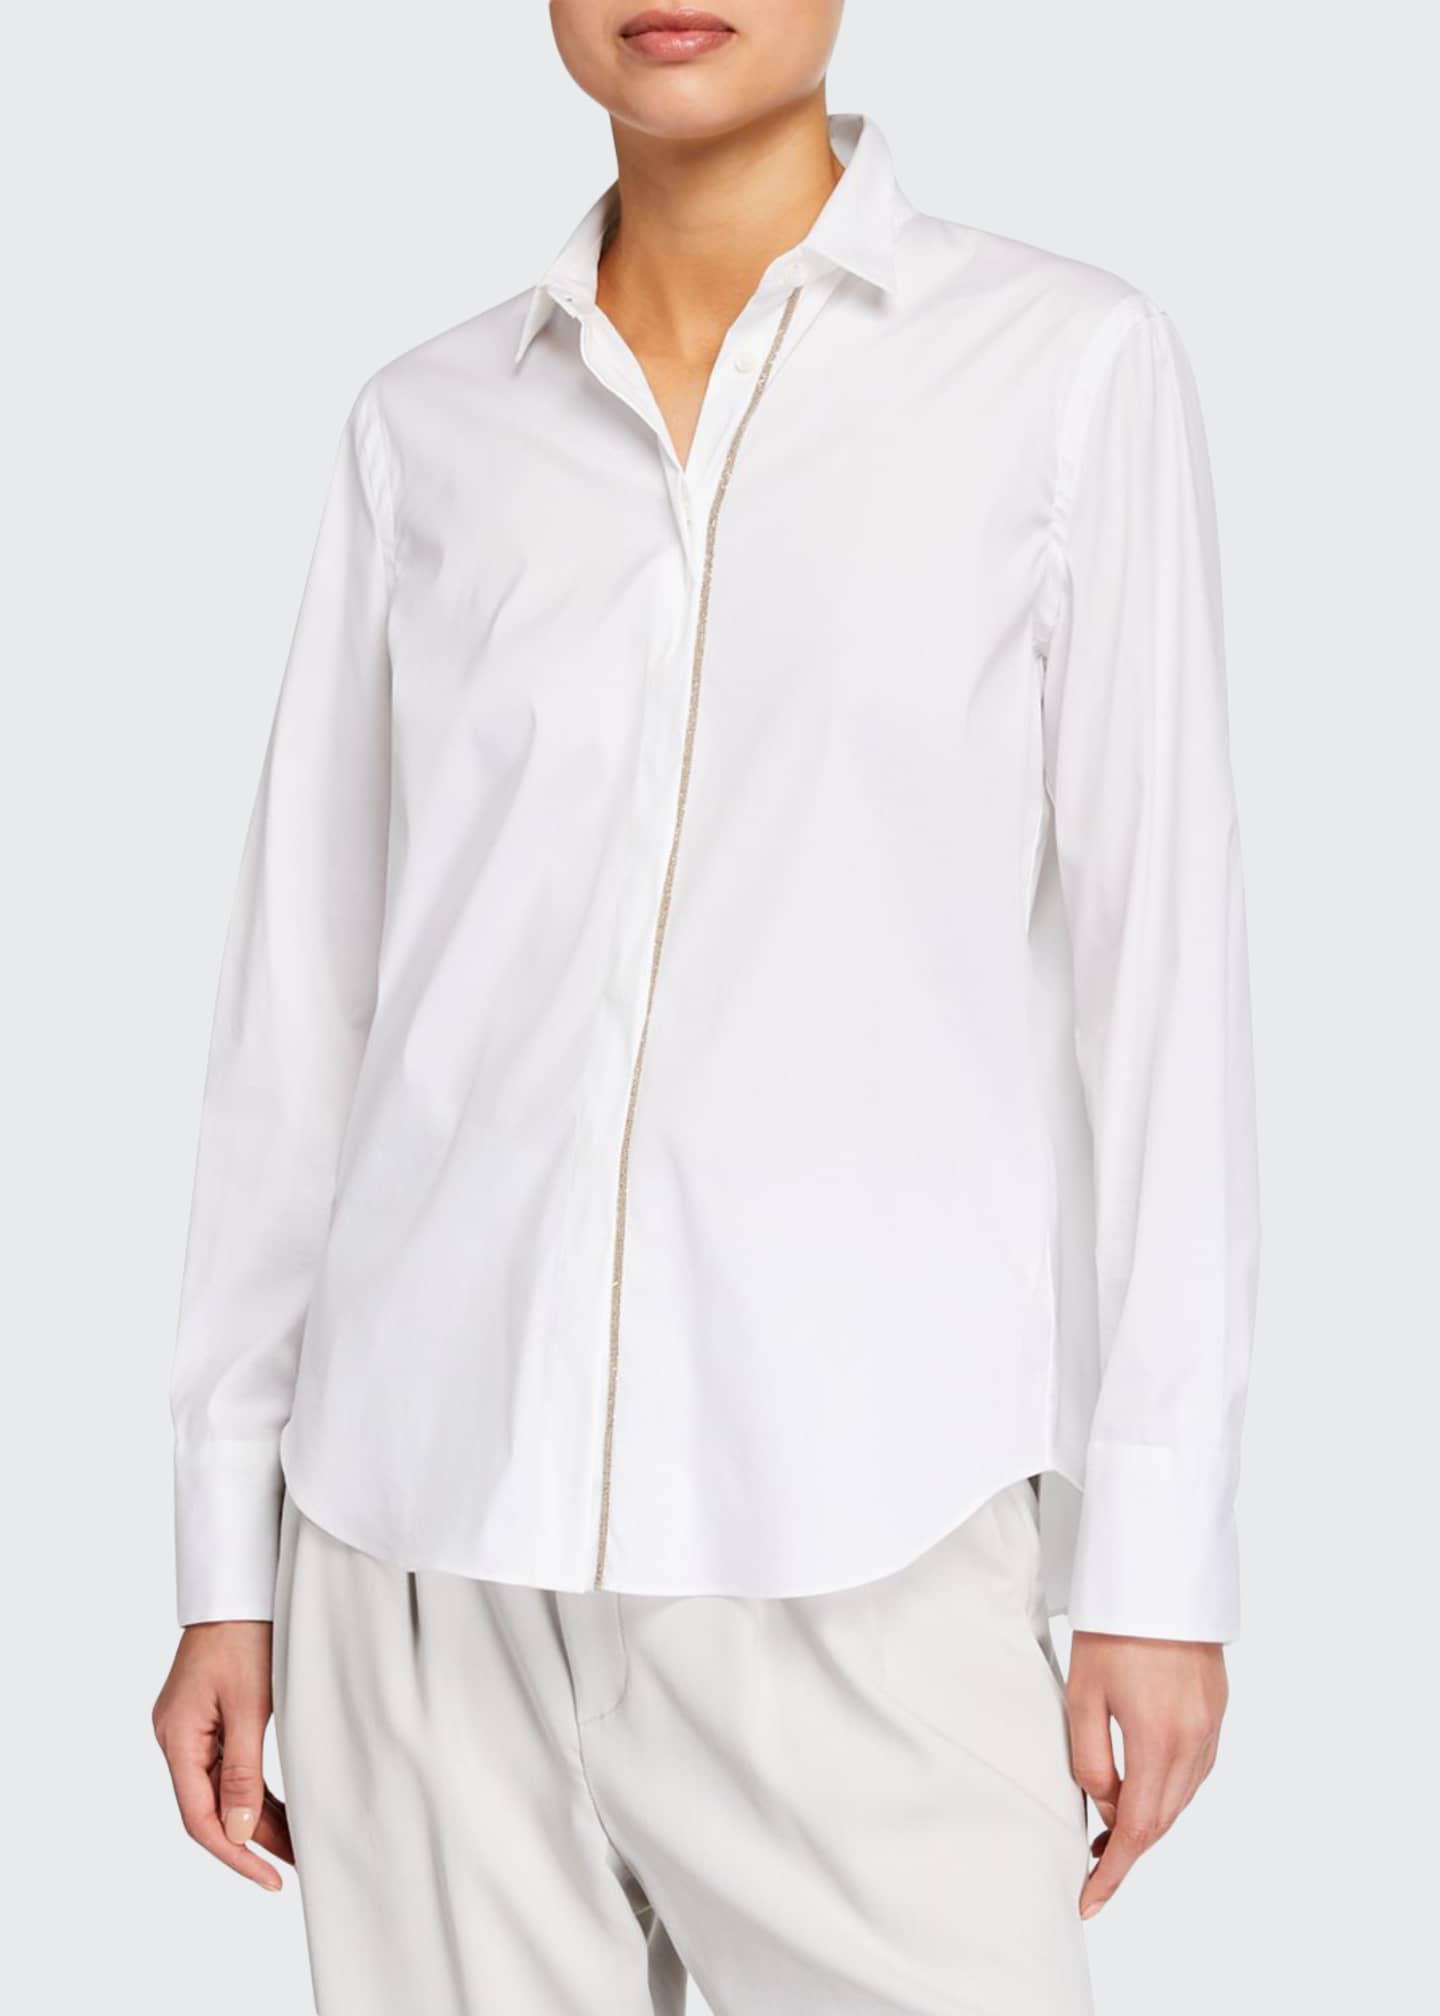 Brunello Cucinelli Monili-Placket Regular-Fit Poplin Shirt